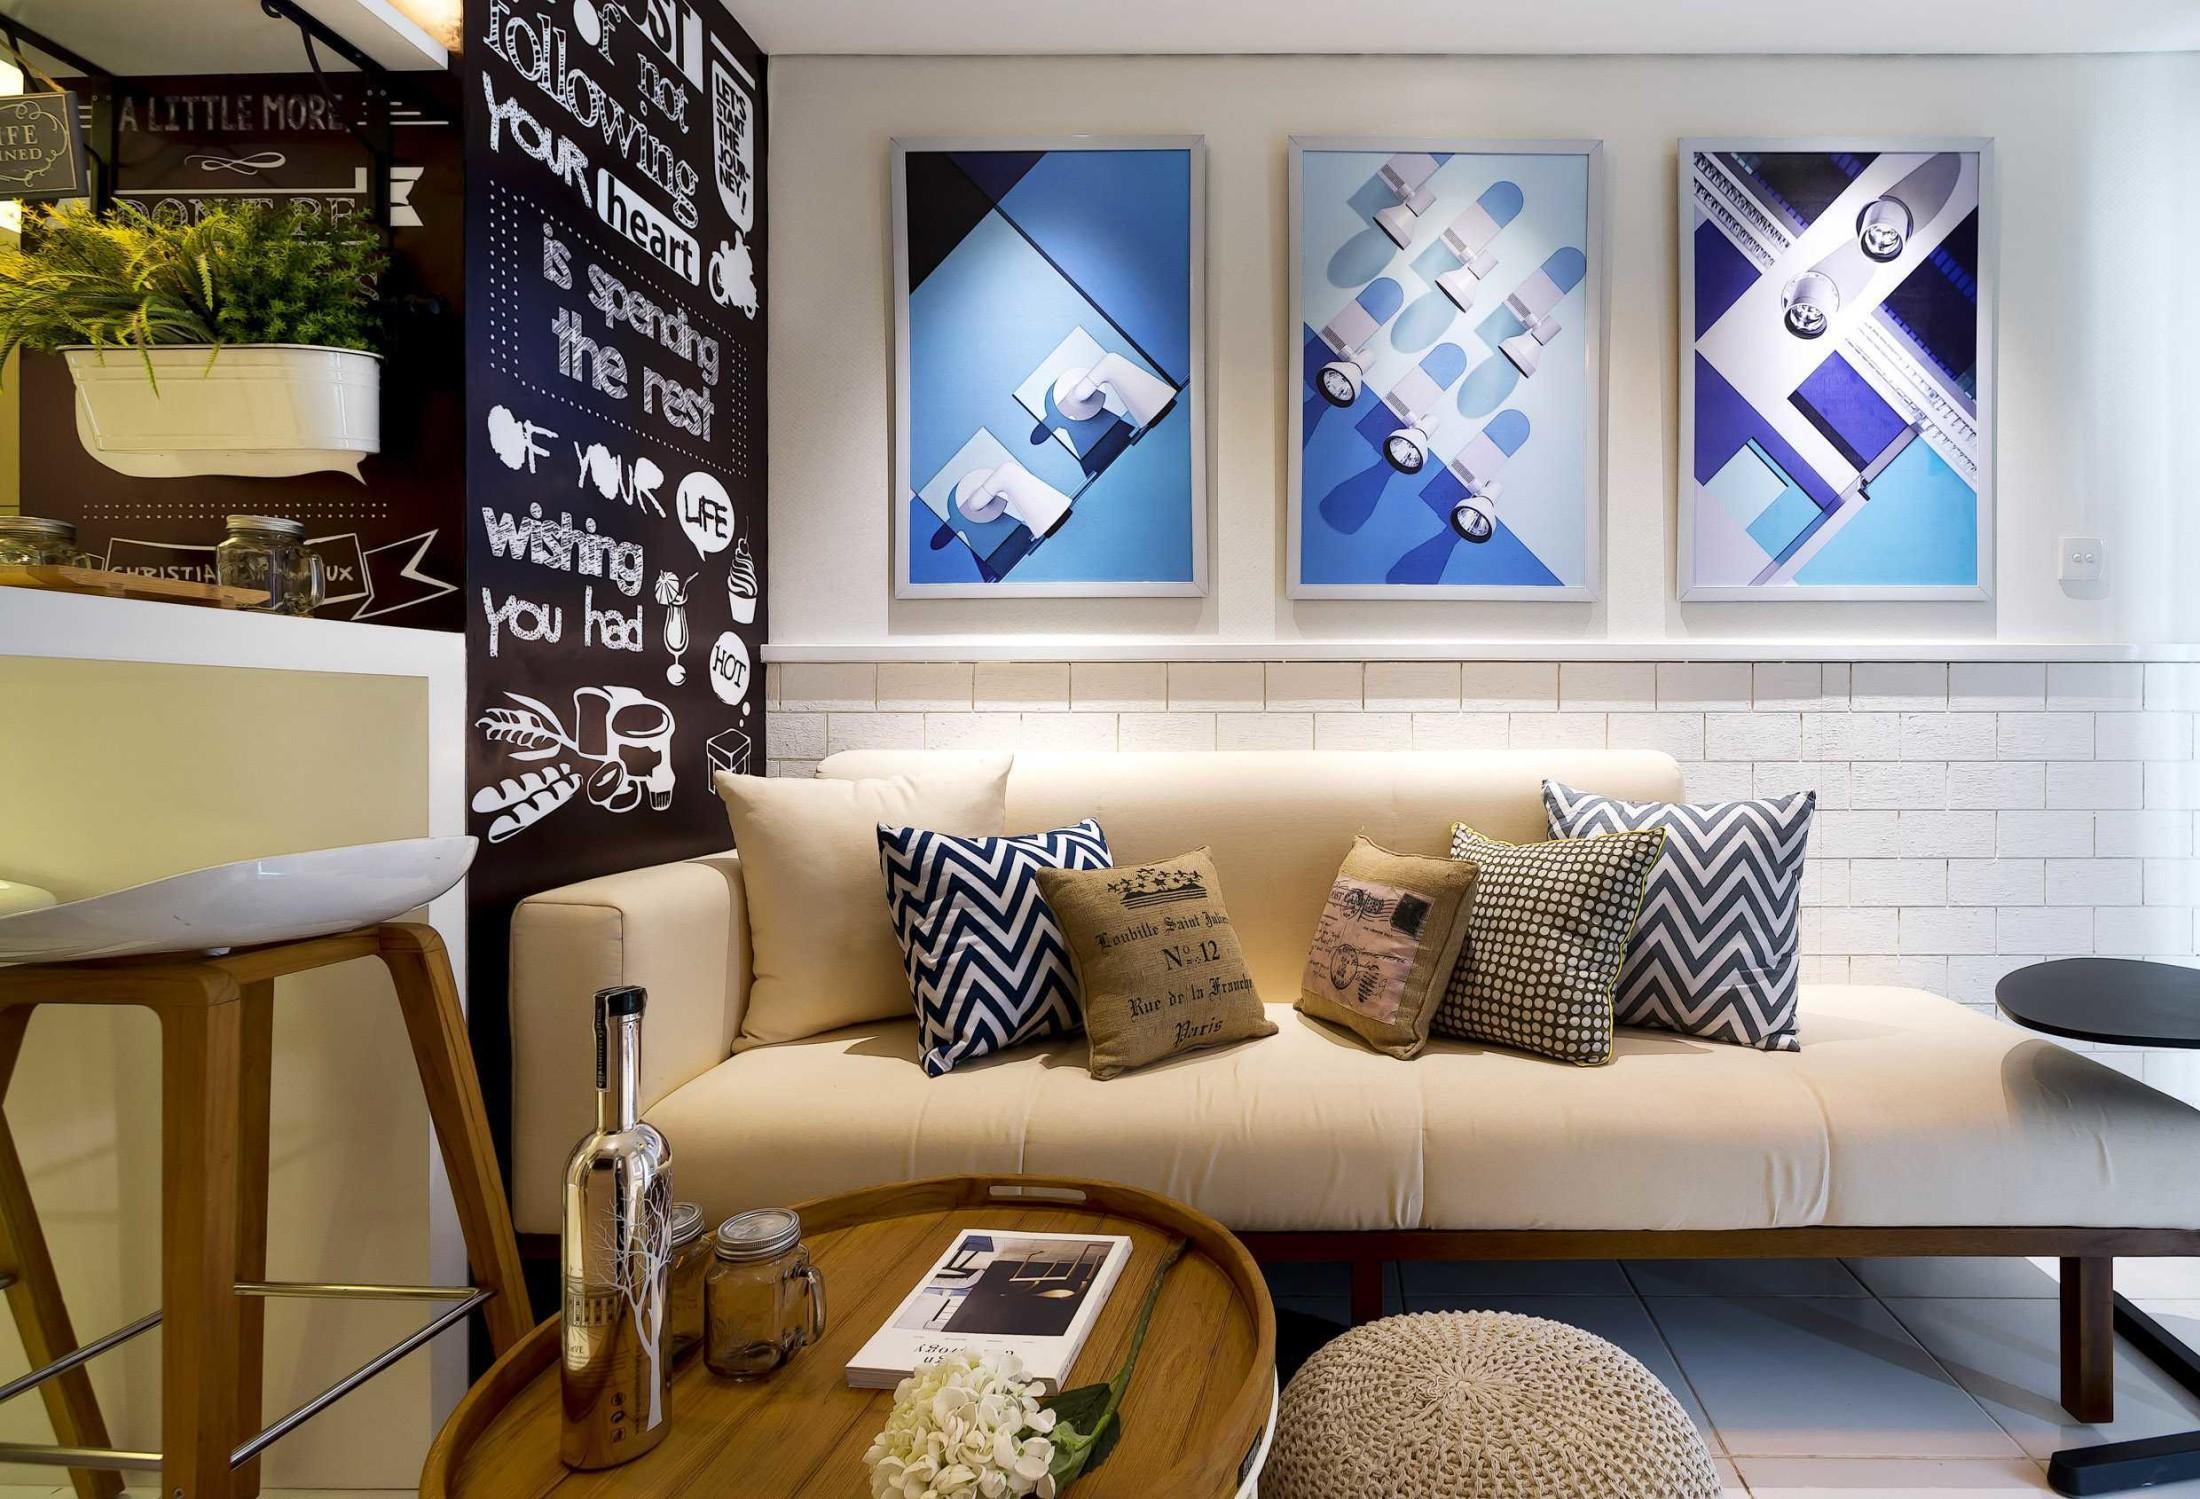 Inspirasi Desain Interior Apartemen Mungil yang Super Nyaman | Foto artikel Arsitag